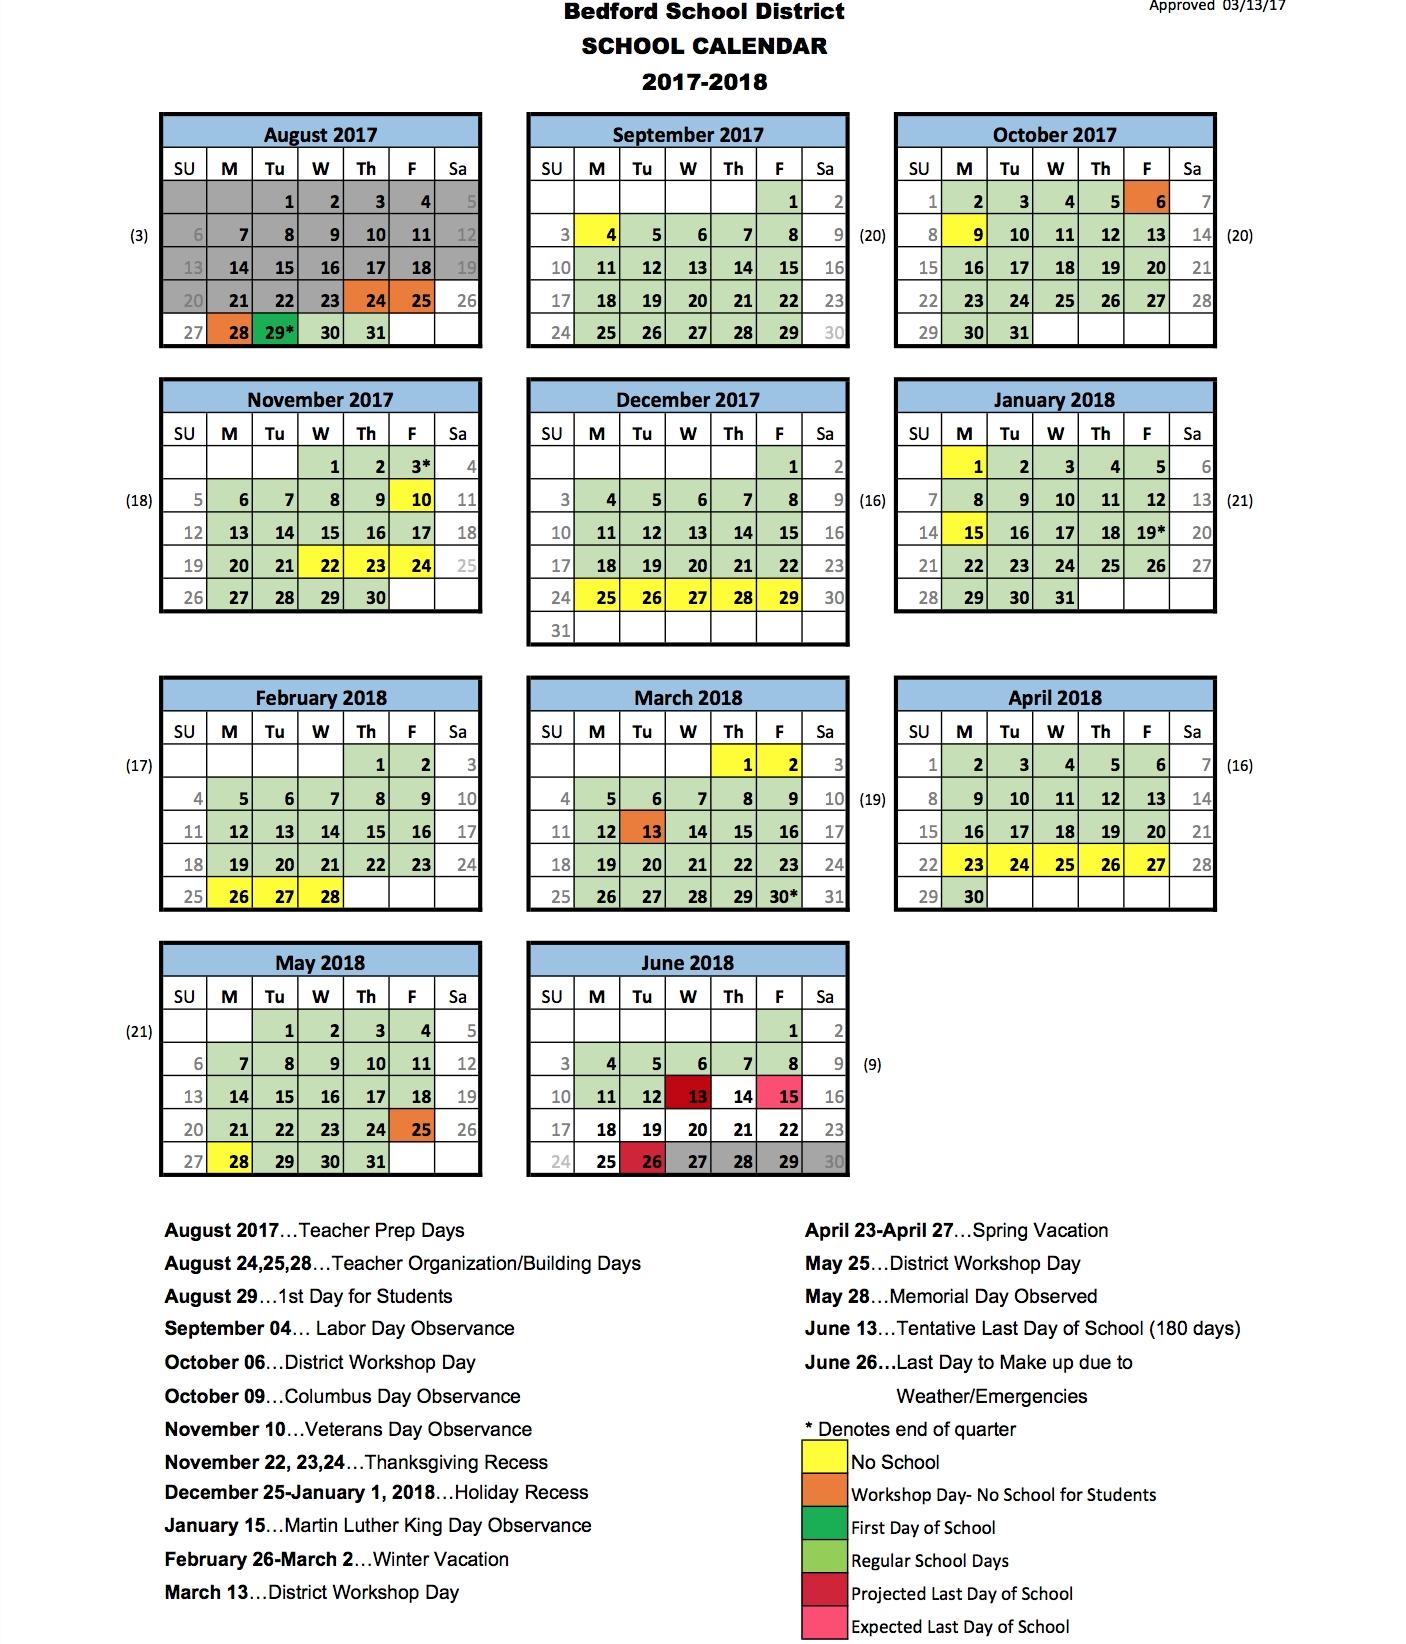 School District Calendar | Bedford Ptg_Sau 9 School Calendar